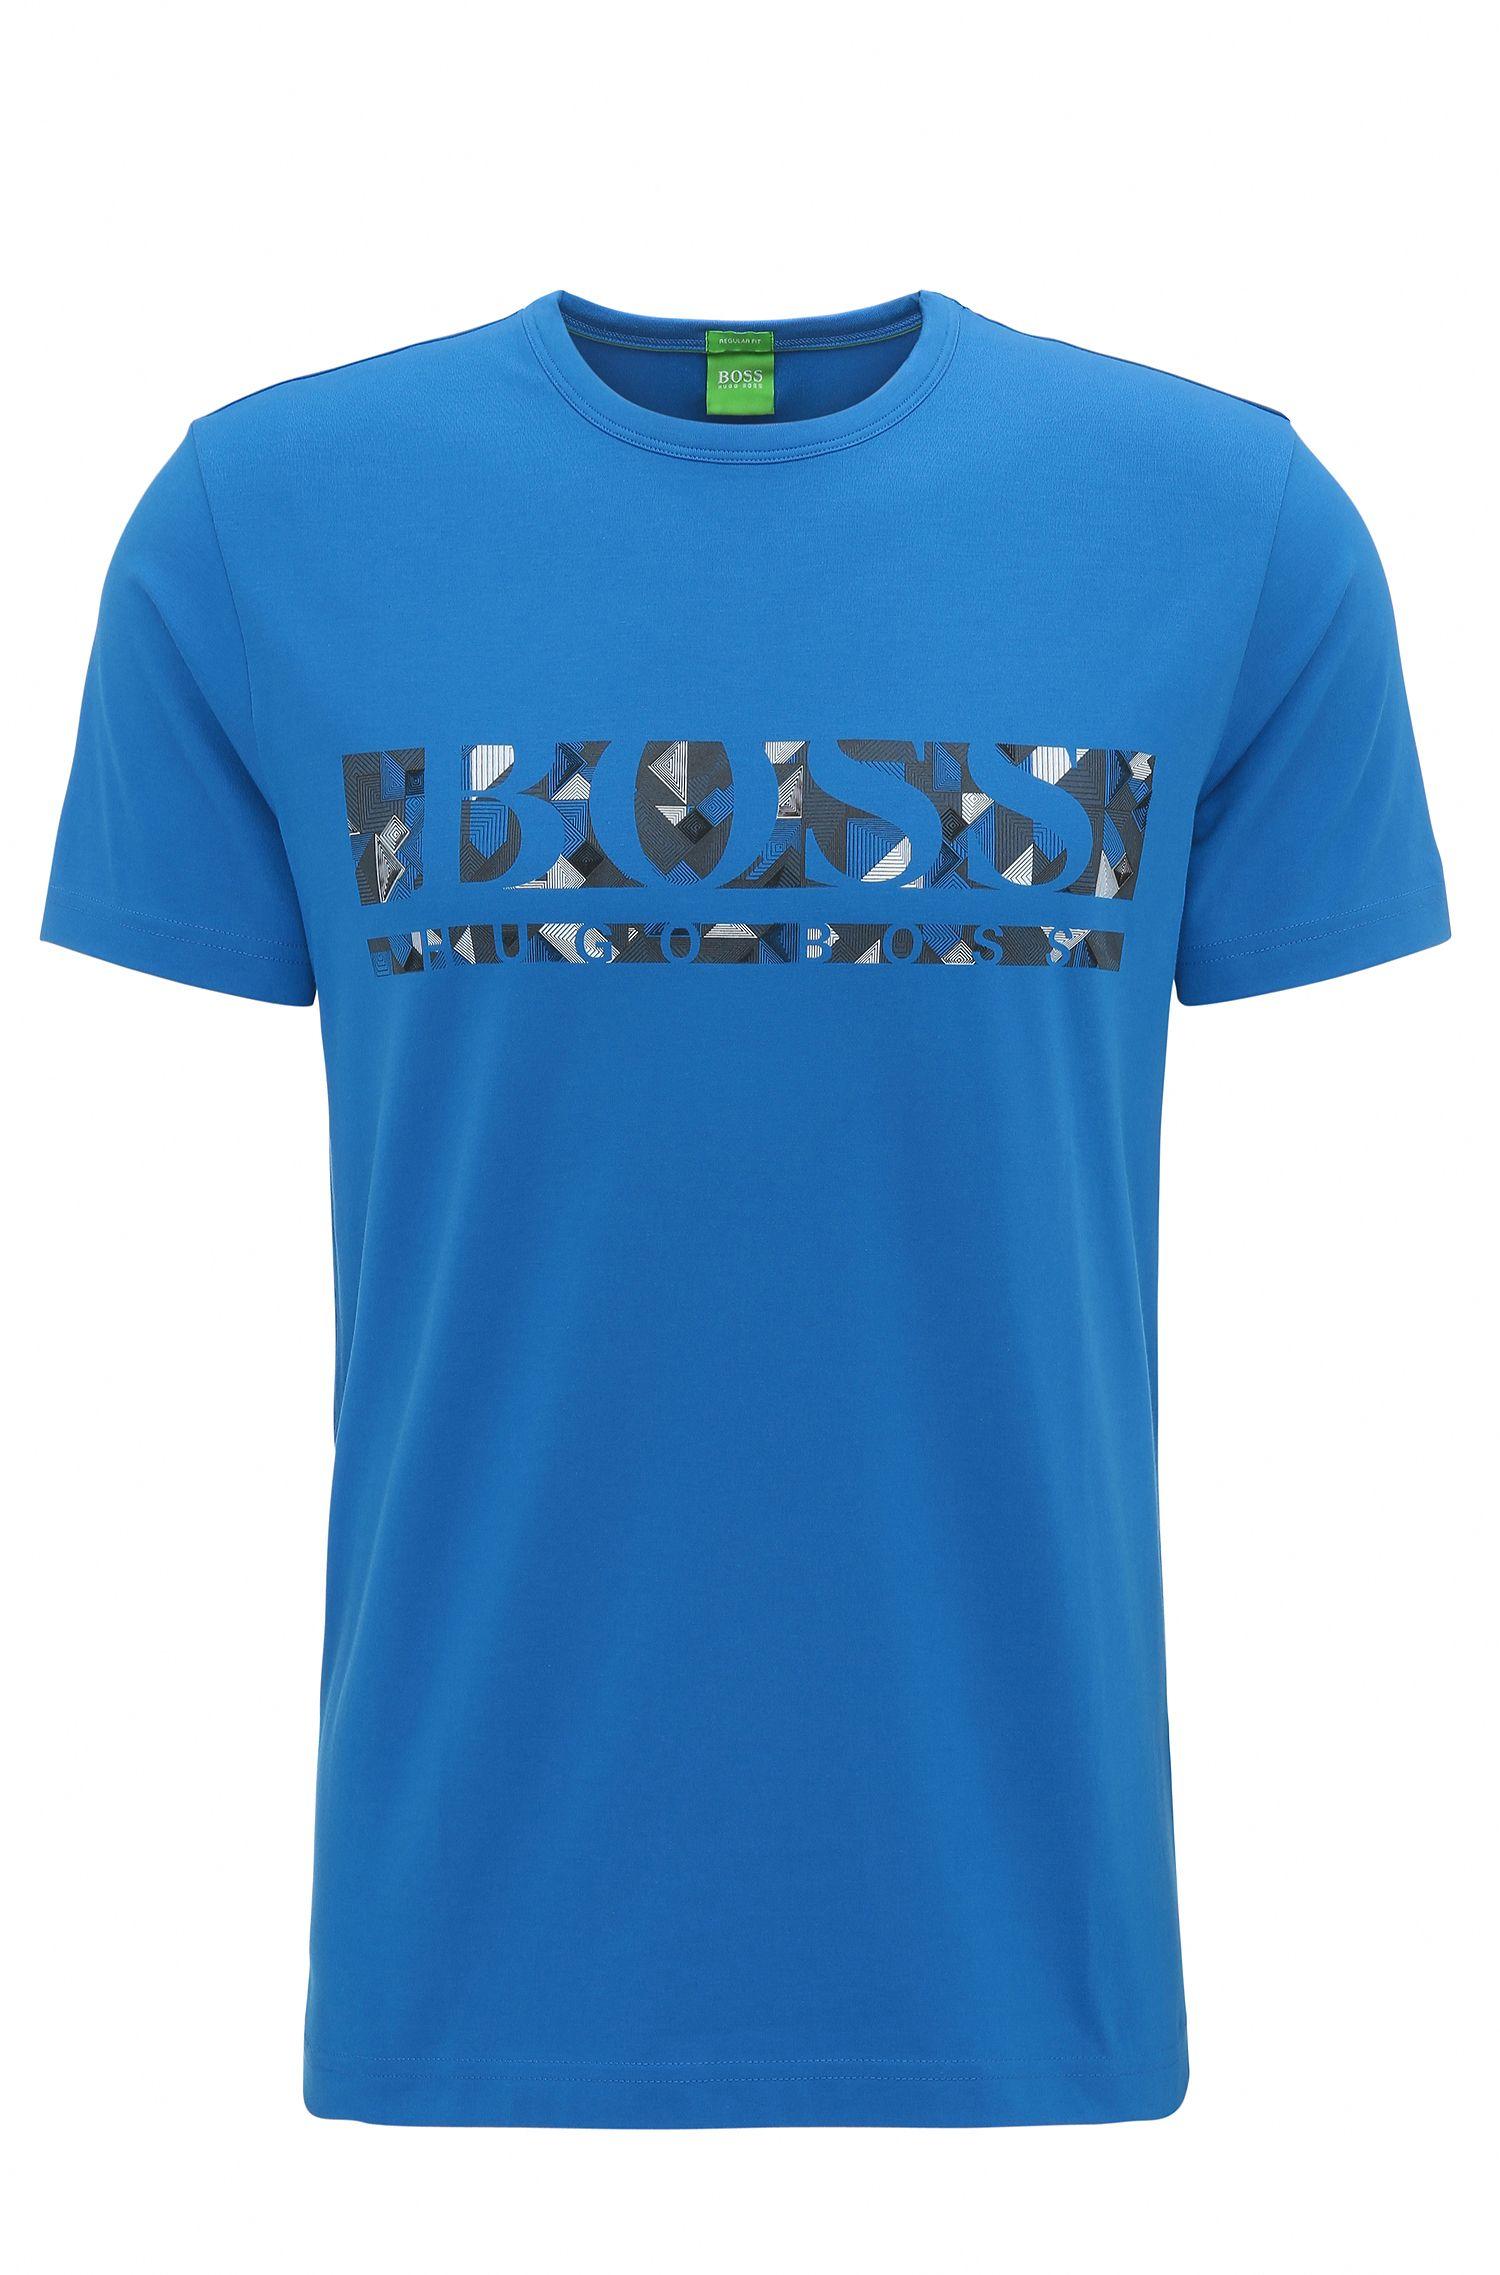 Logo-Print Stretch Cotton Graphic T-Shirt | Tee